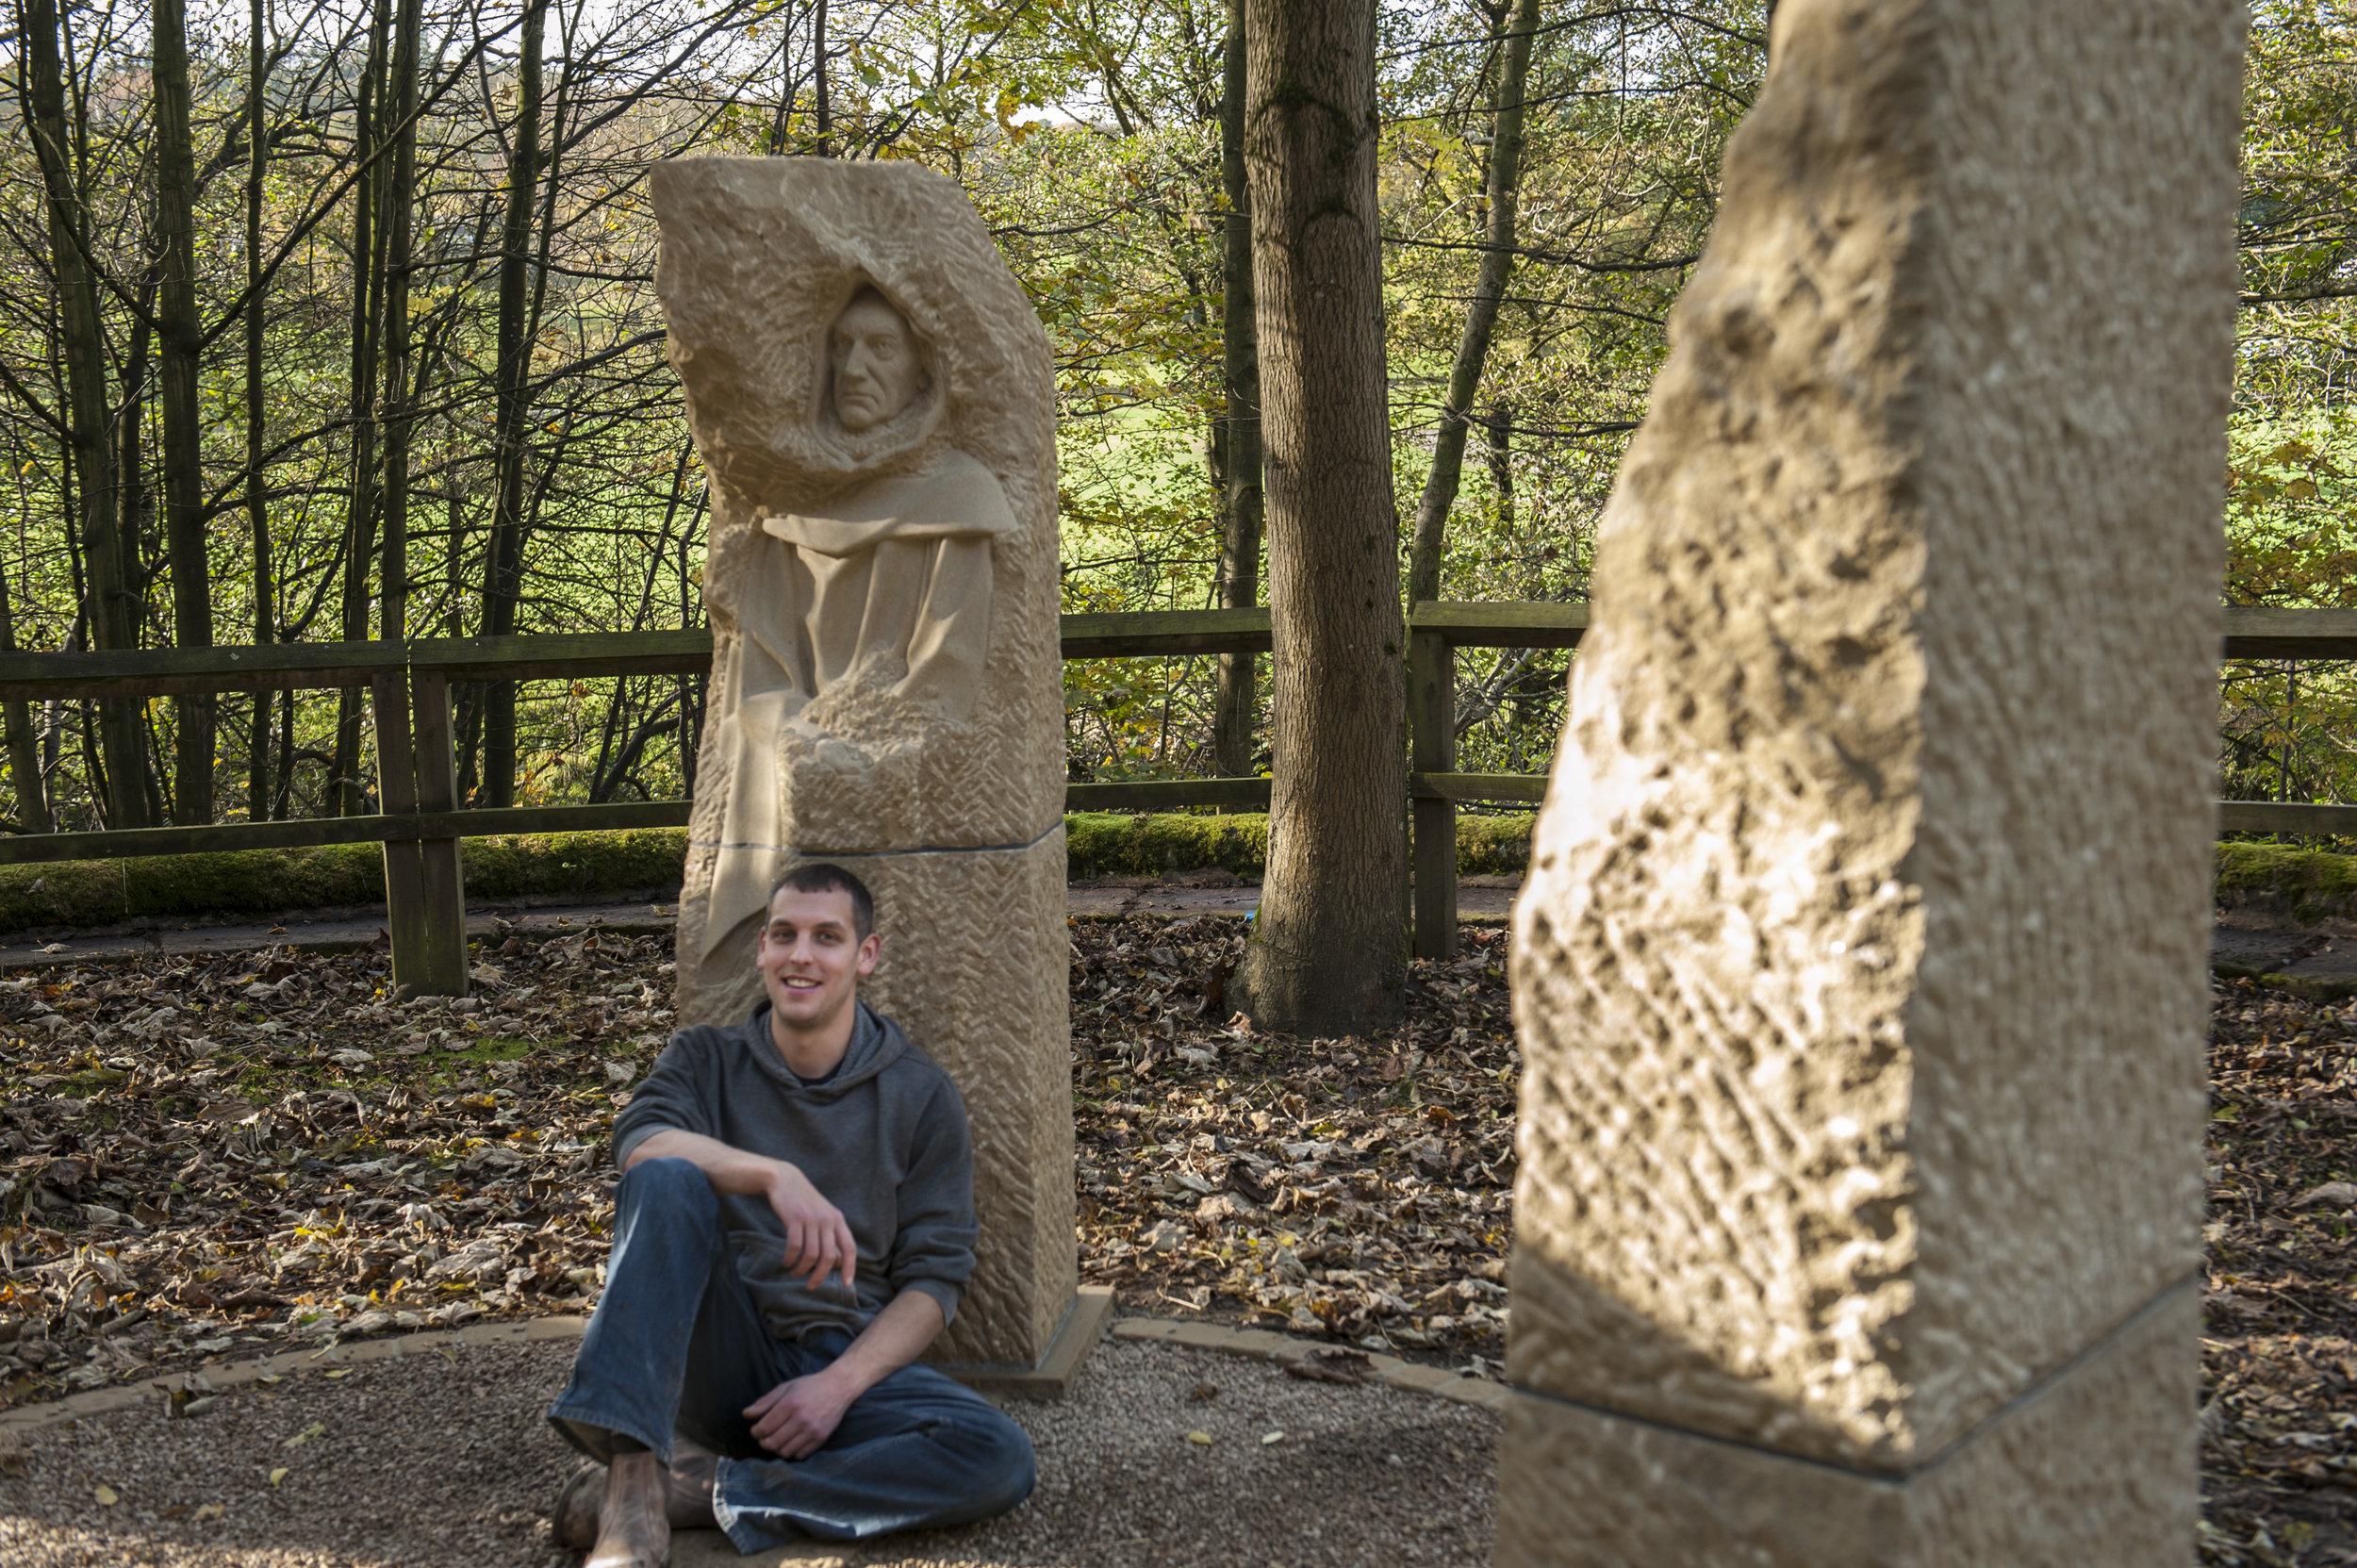 Joseph with Pillars Past - photo by Paul Harris